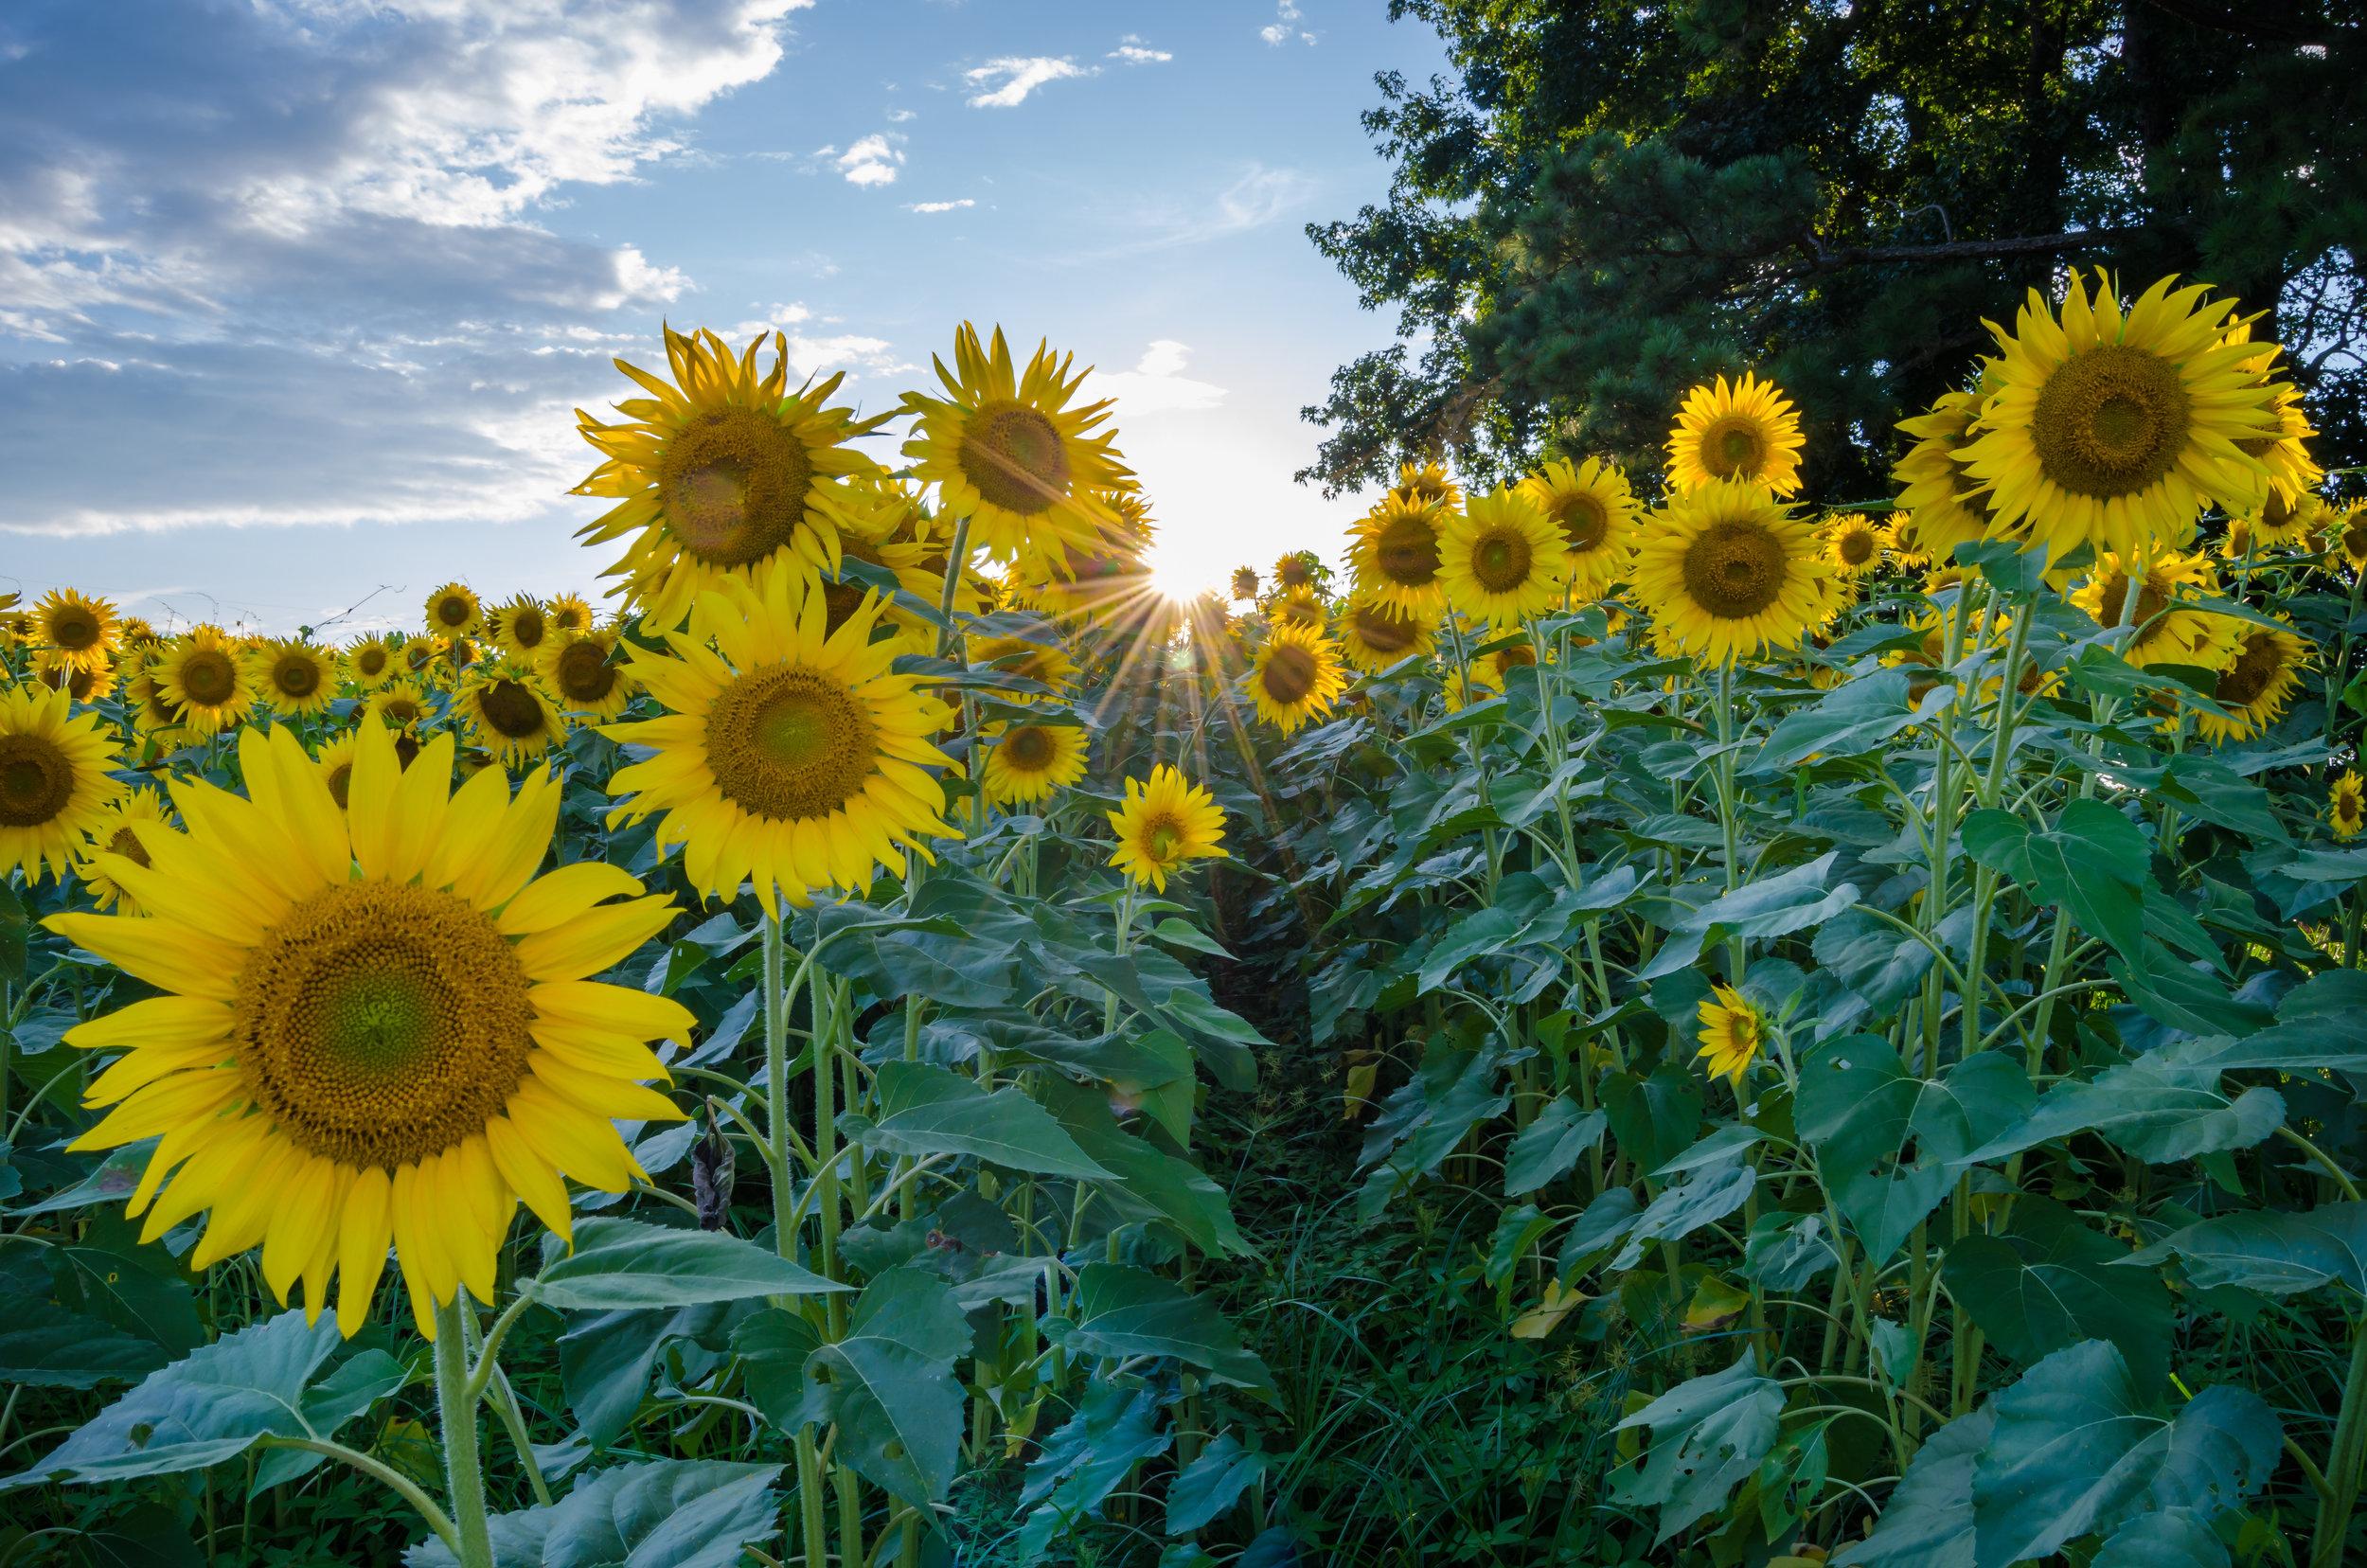 sunflowers-isle of wight county-virginia-sunset.jpg